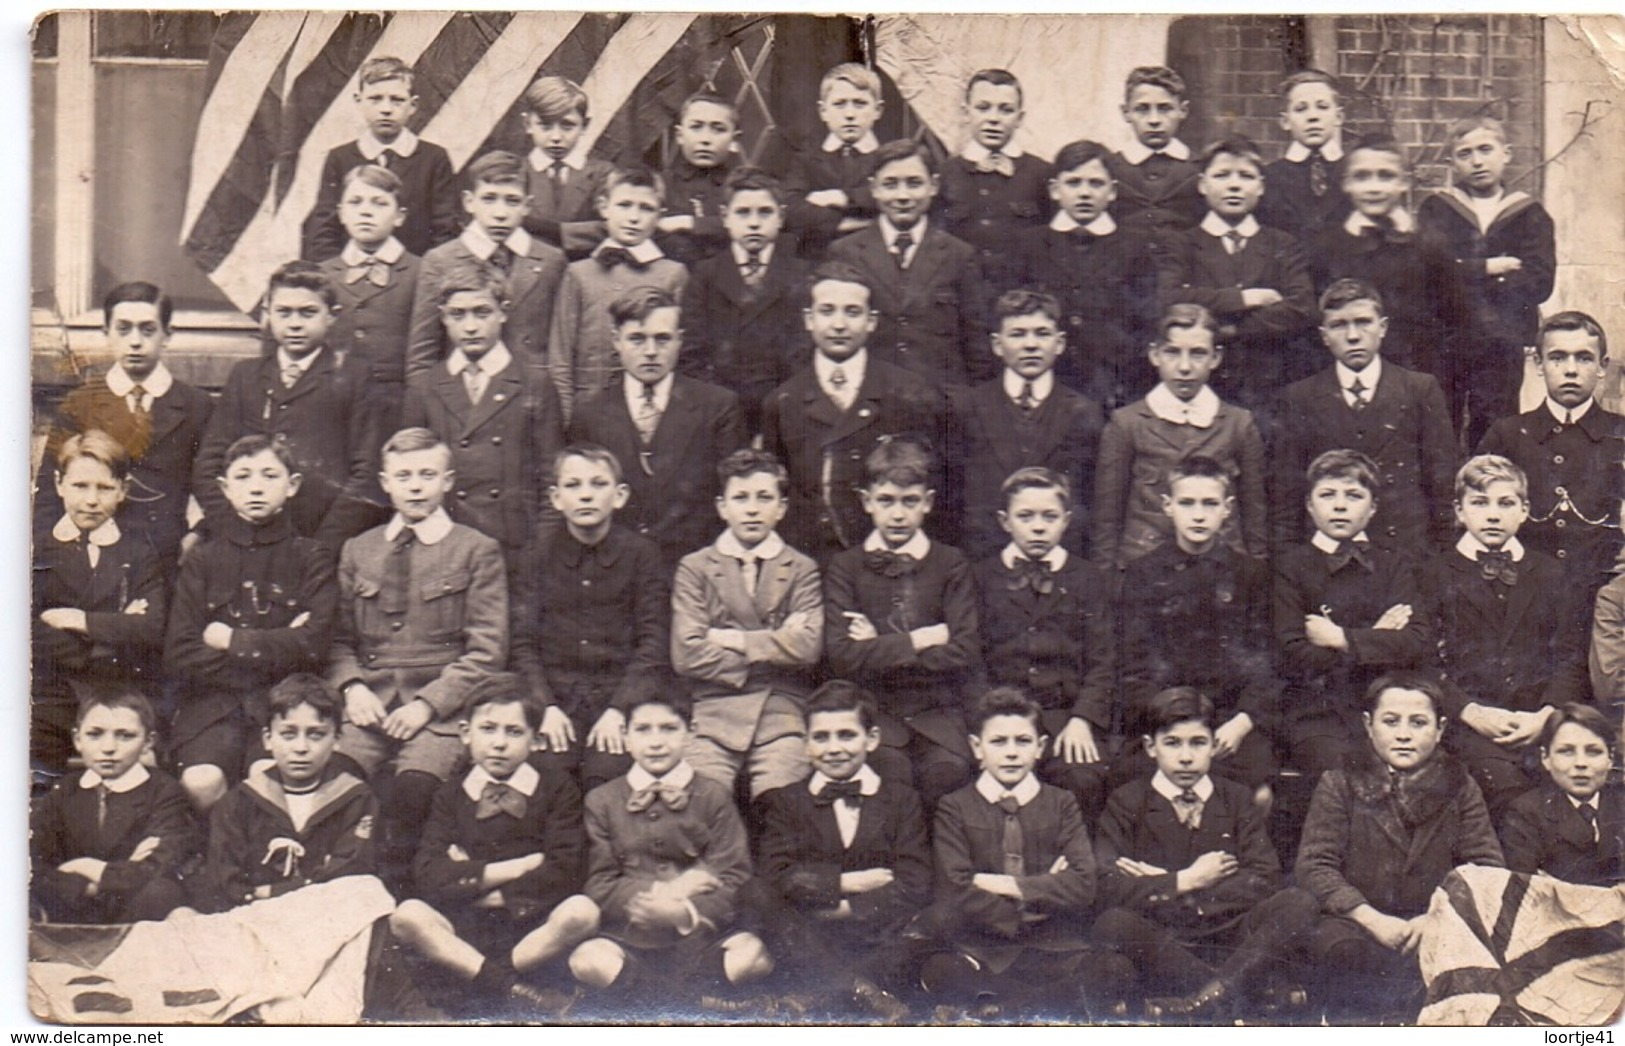 Photo Carte Photo Foto Fotokaart - Souvenir  Lat. Collège St Joseph Alast Aalst - C. De Kegel - 1919 - 1920 - Photos